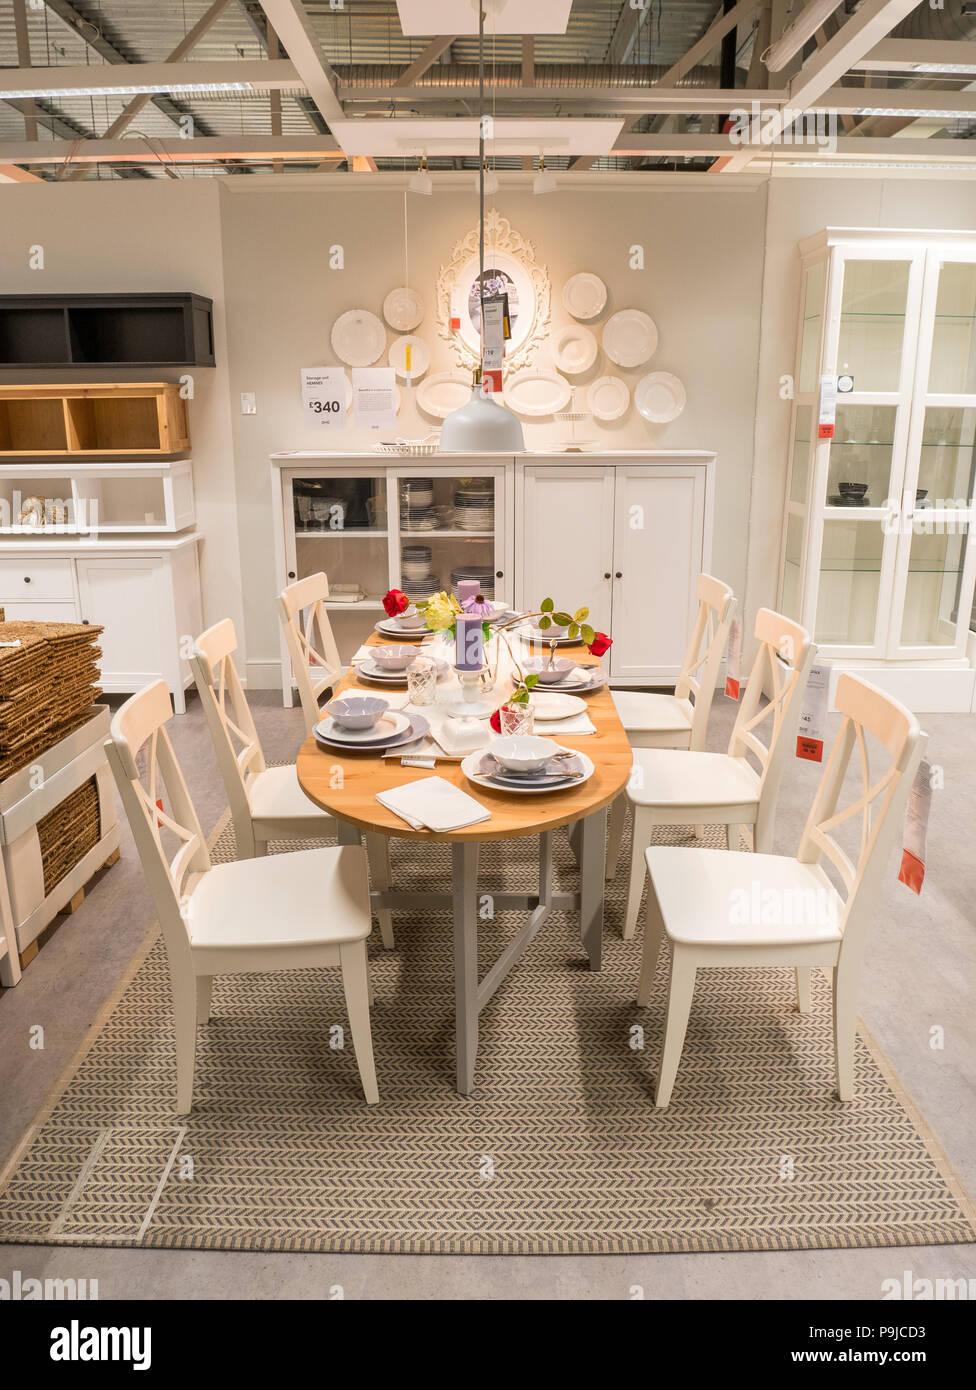 Esszimmer Mobel Bei Ikea Grossbritannien Stockfotografie Alamy